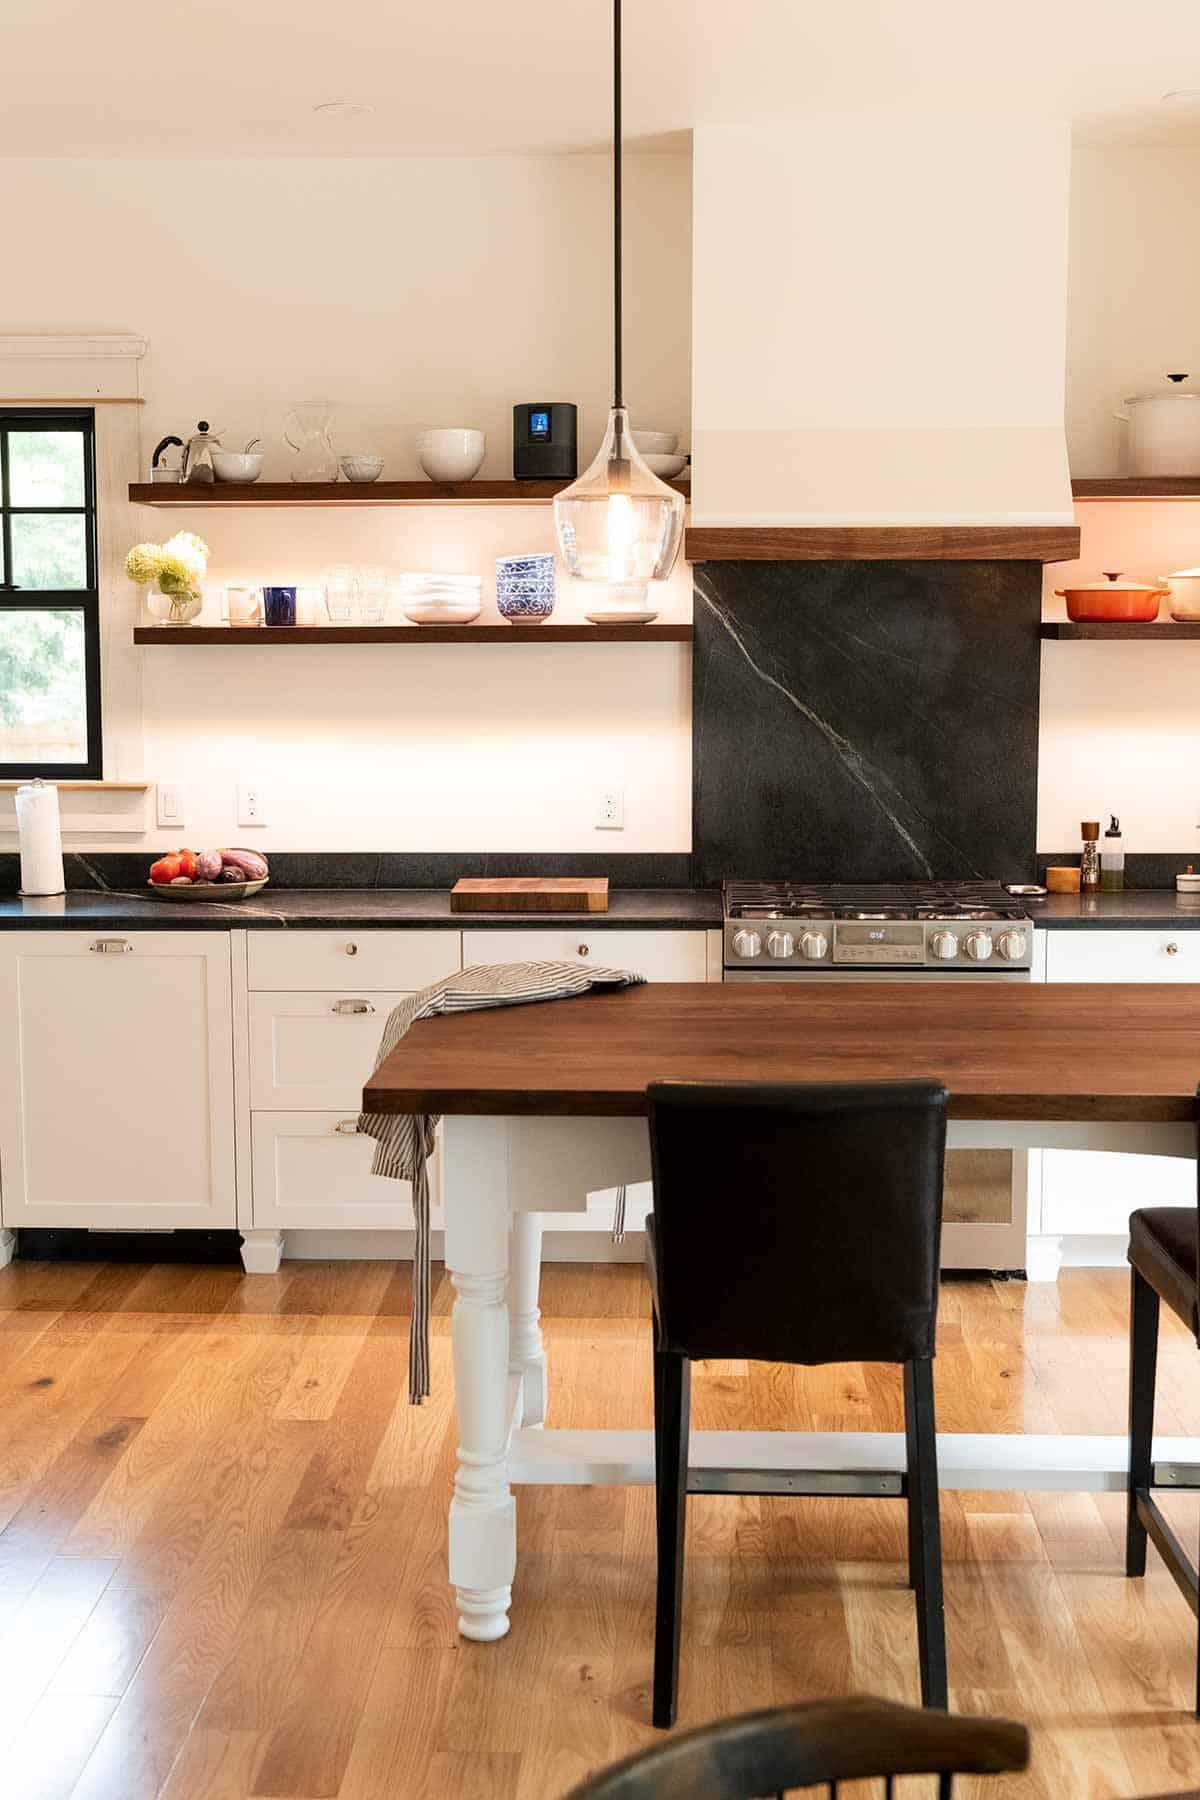 Remodeled kitchen with floating shelves